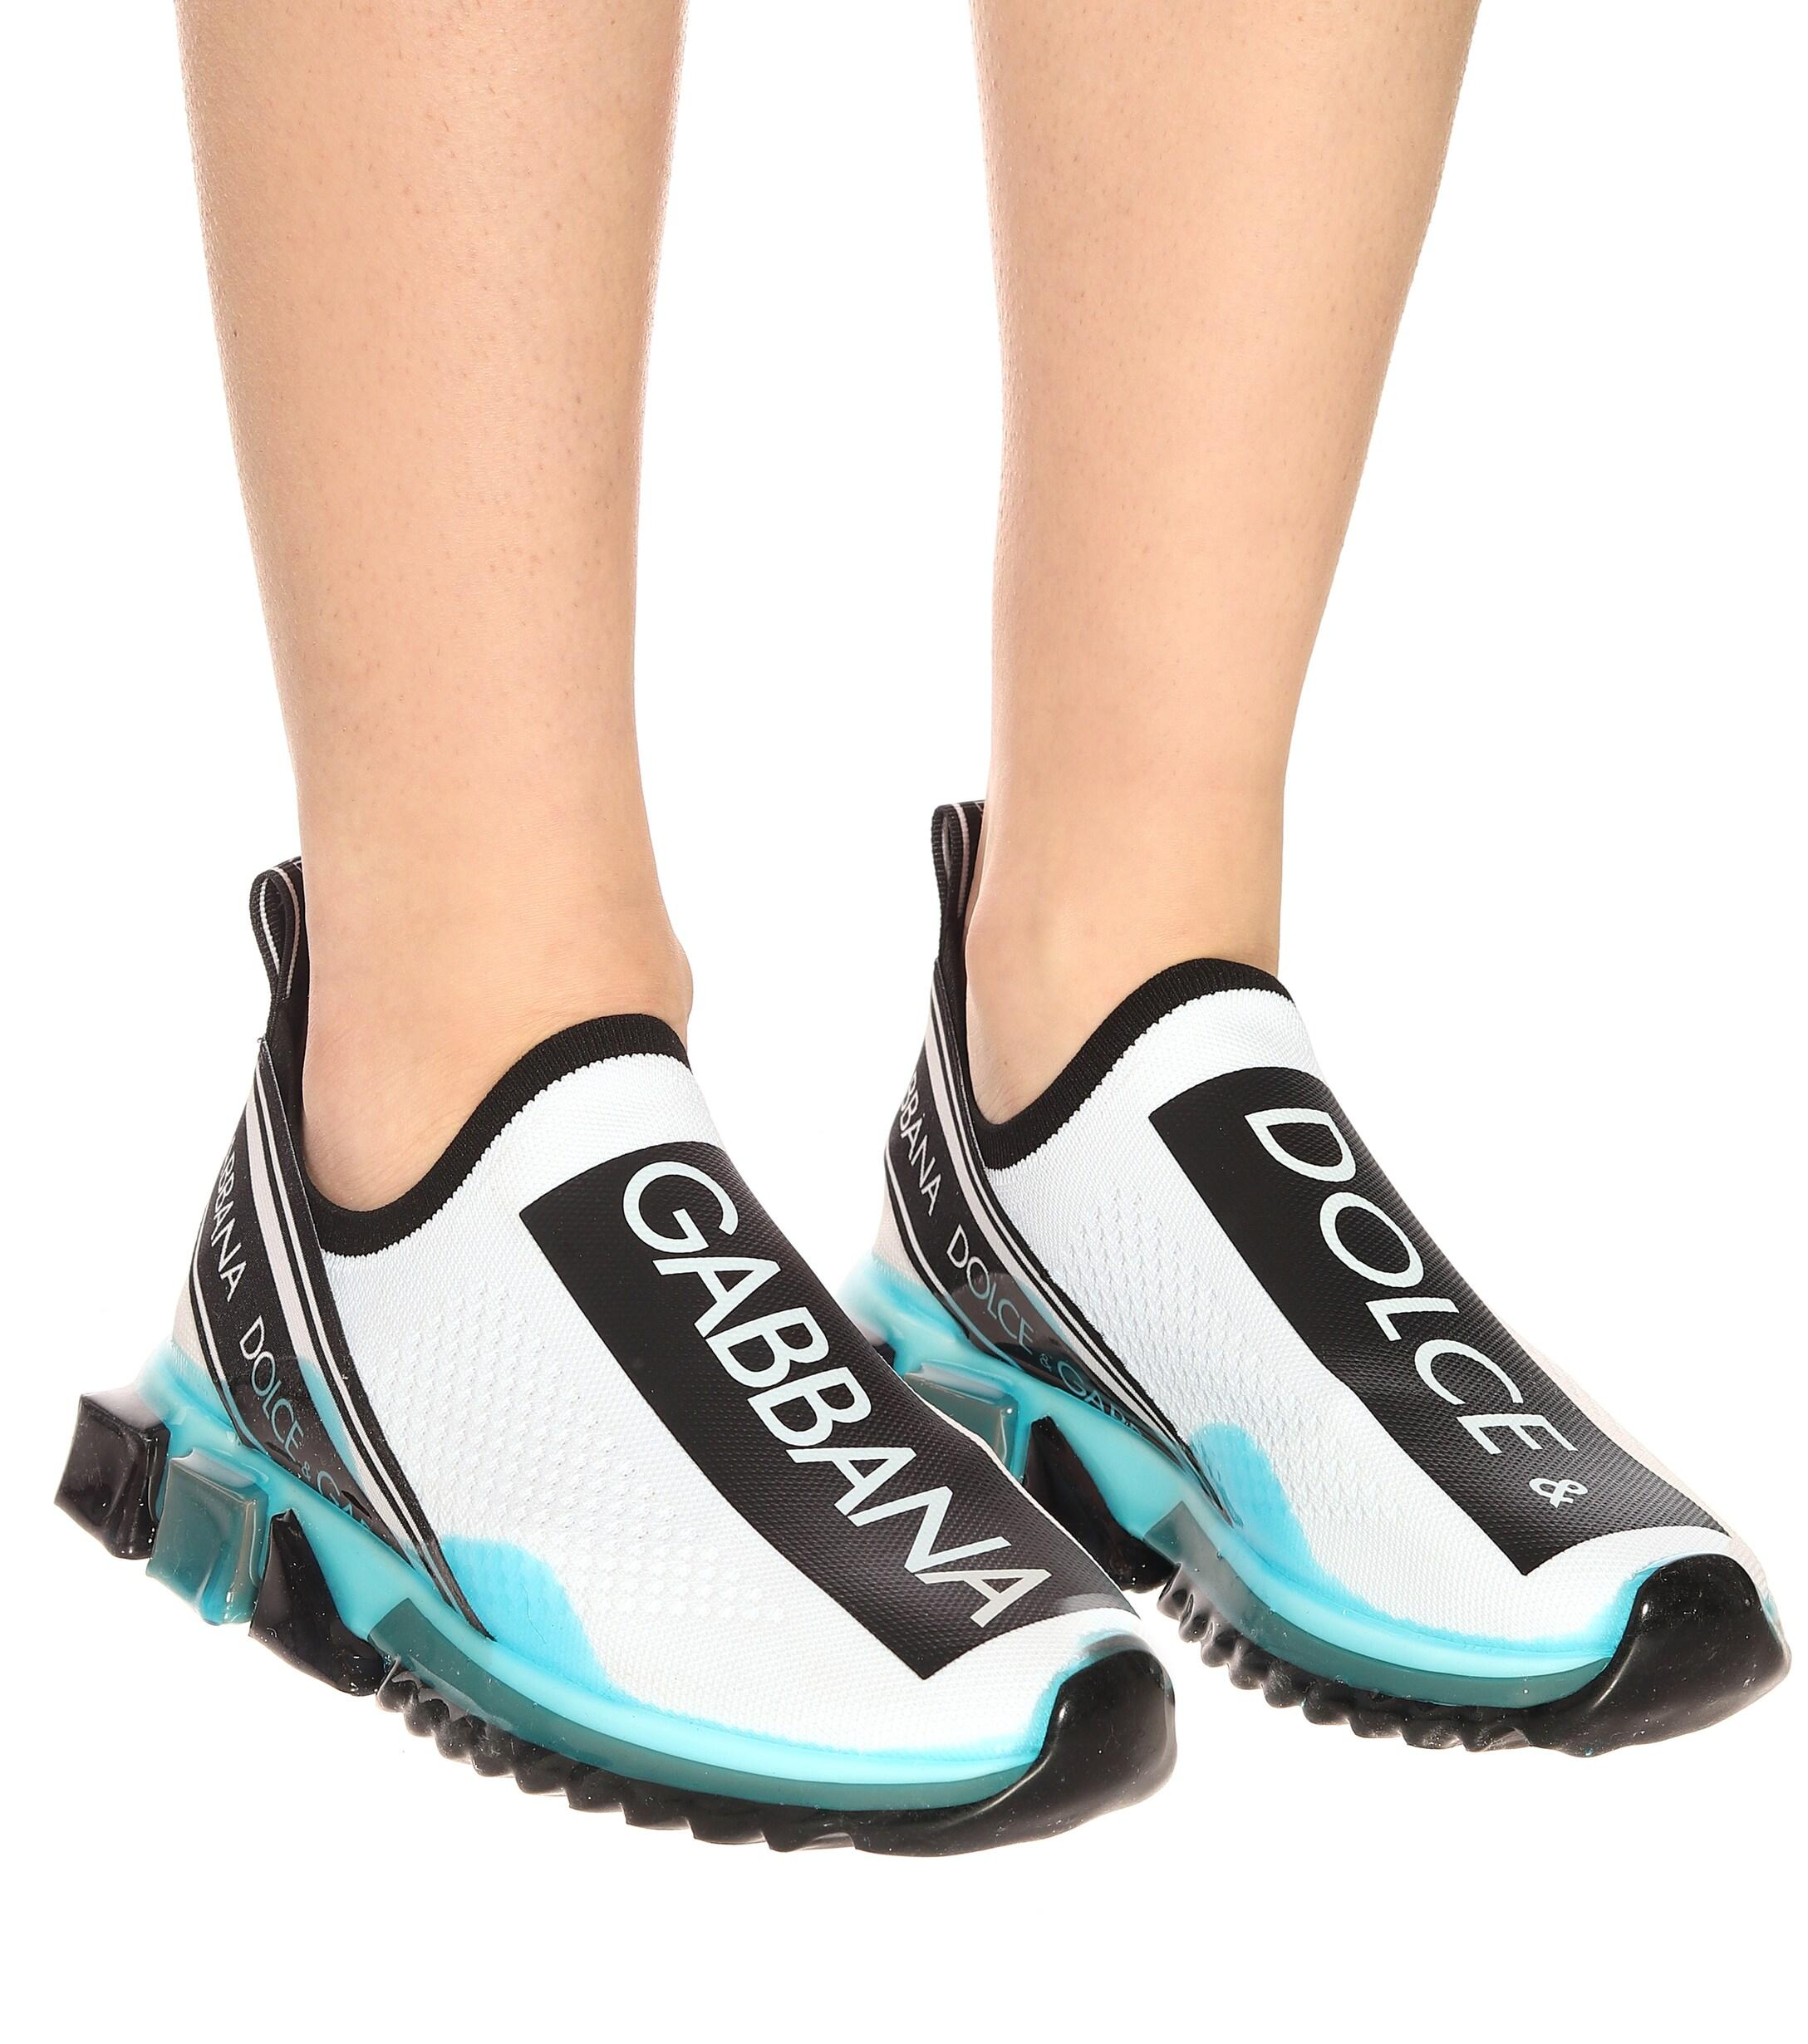 Dolce \u0026 Gabbana Sorrento Melt Sneakers